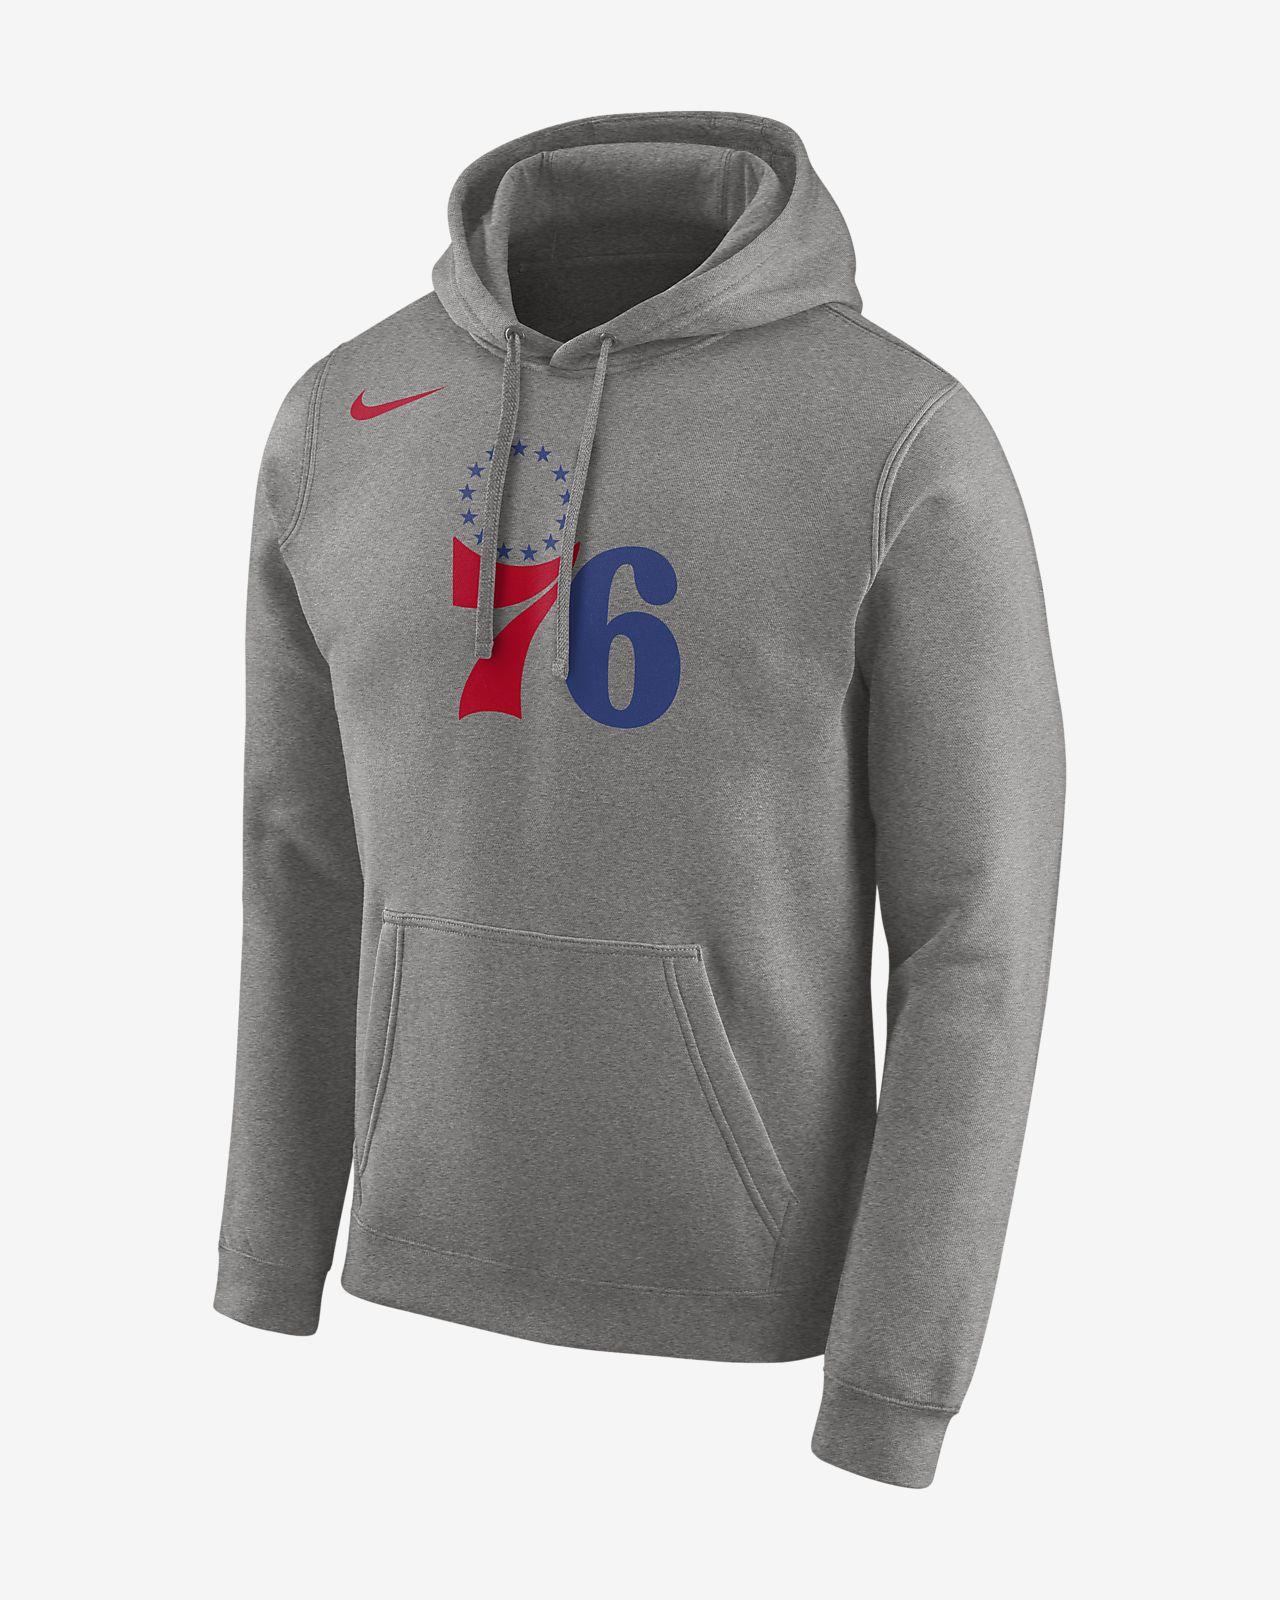 Philadelphia 76ers Nike NBA Logolu Erkek Kapüşonlu Üst